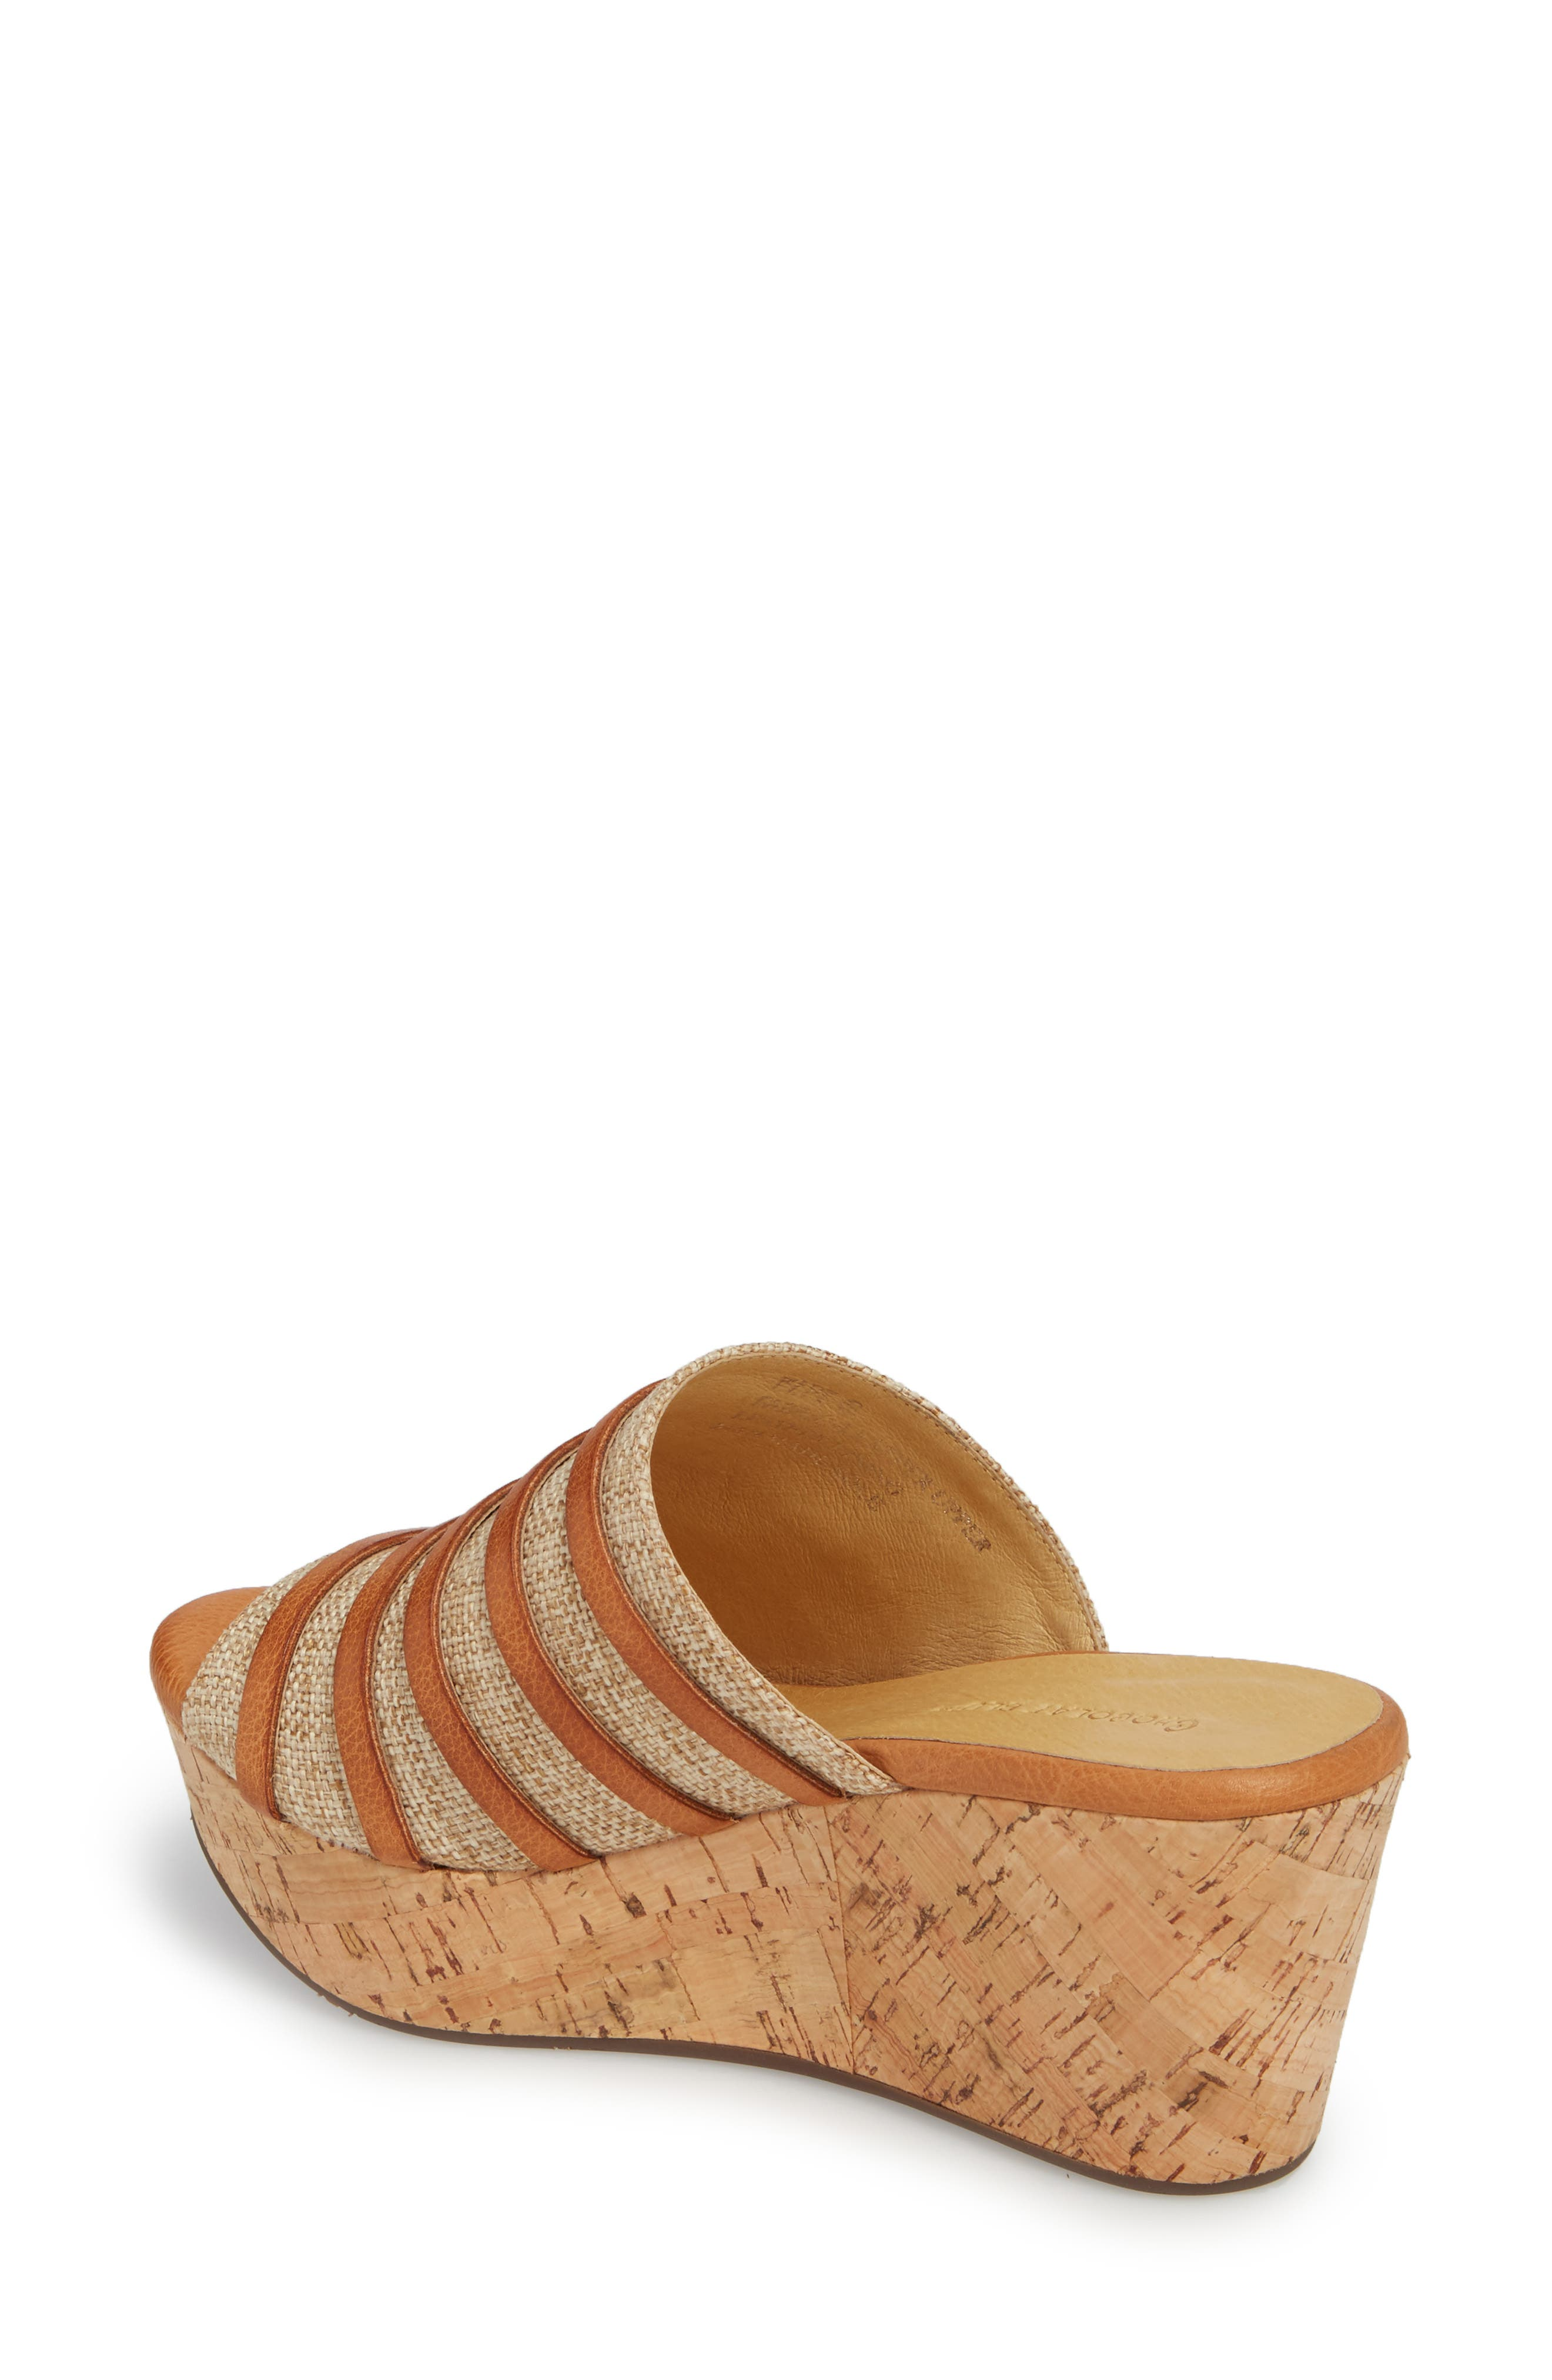 Wapi Wedge Sandal,                             Alternate thumbnail 2, color,                             Camel Leather